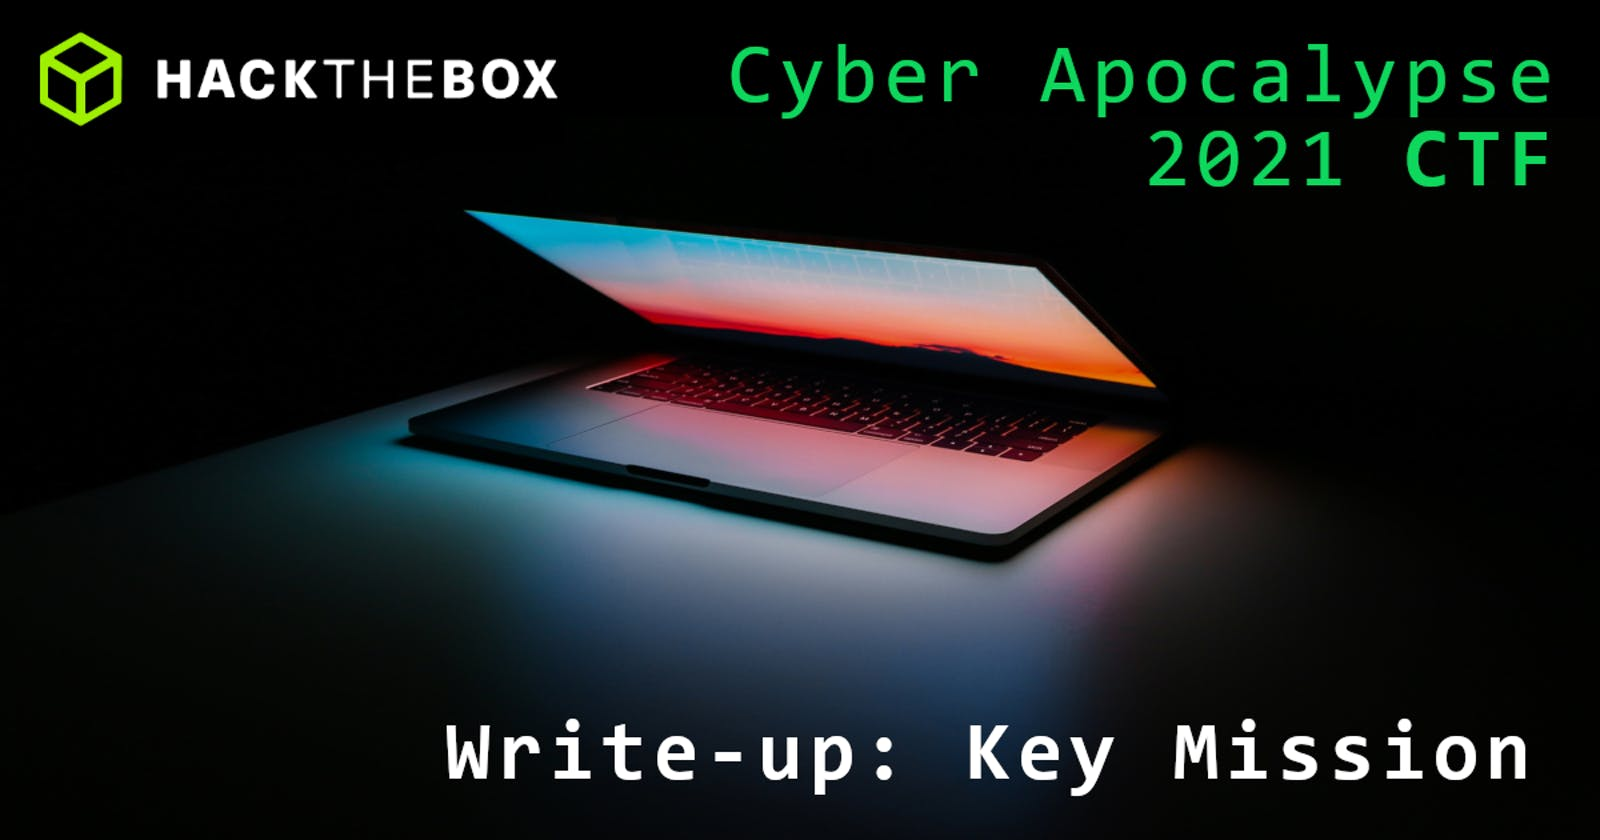 Cyber Apocalypse 2021: Key Mission